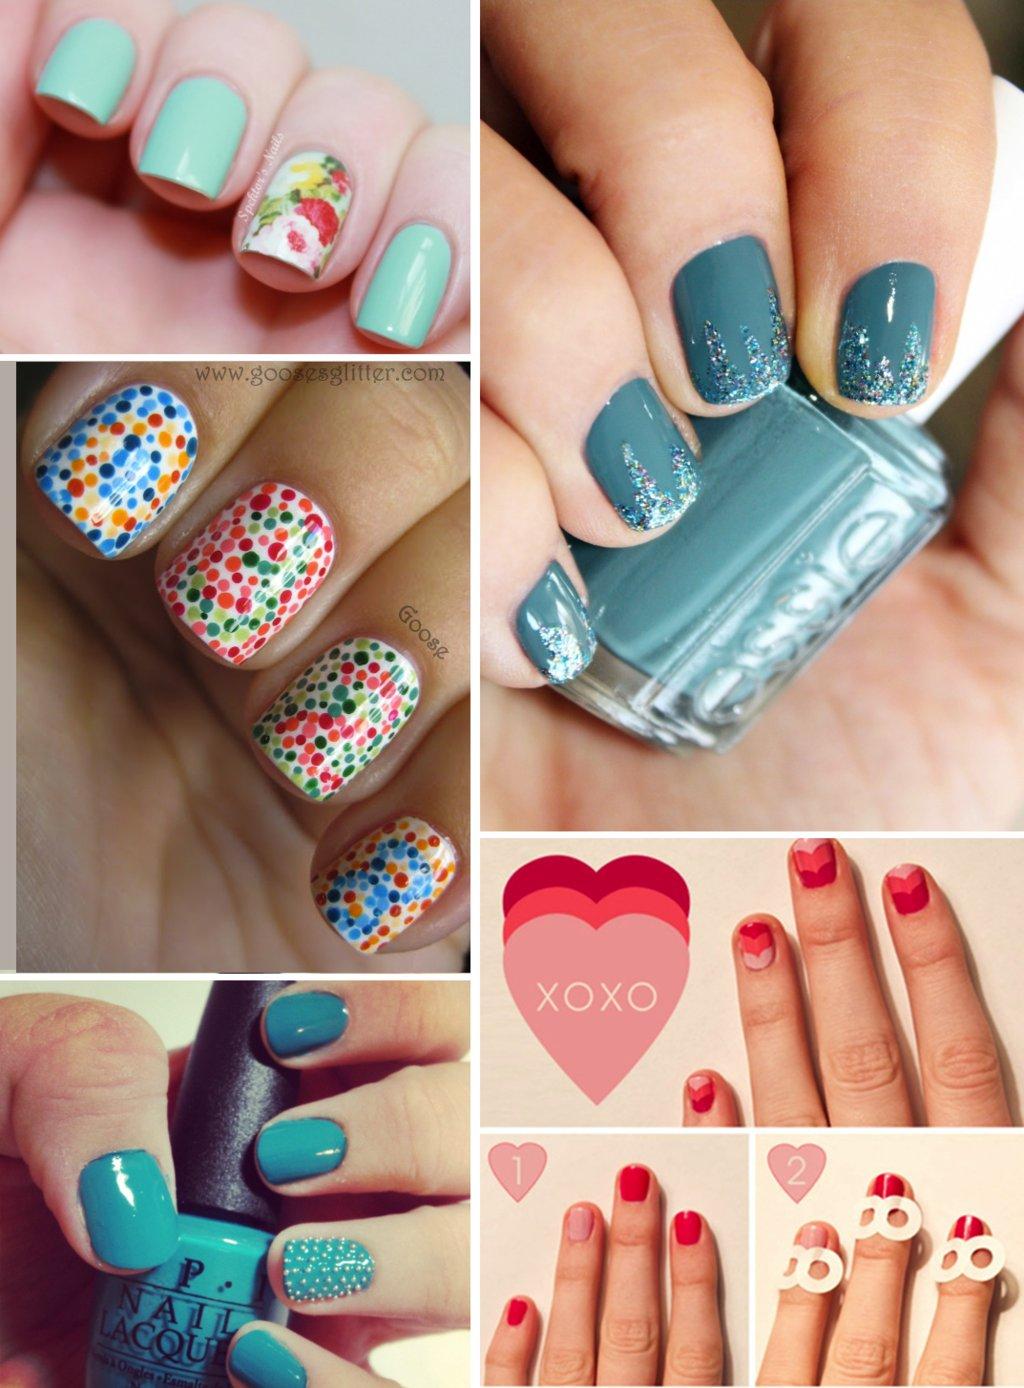 Wedding-beauty-ideas-unique-bridal-nail-styles-4.full